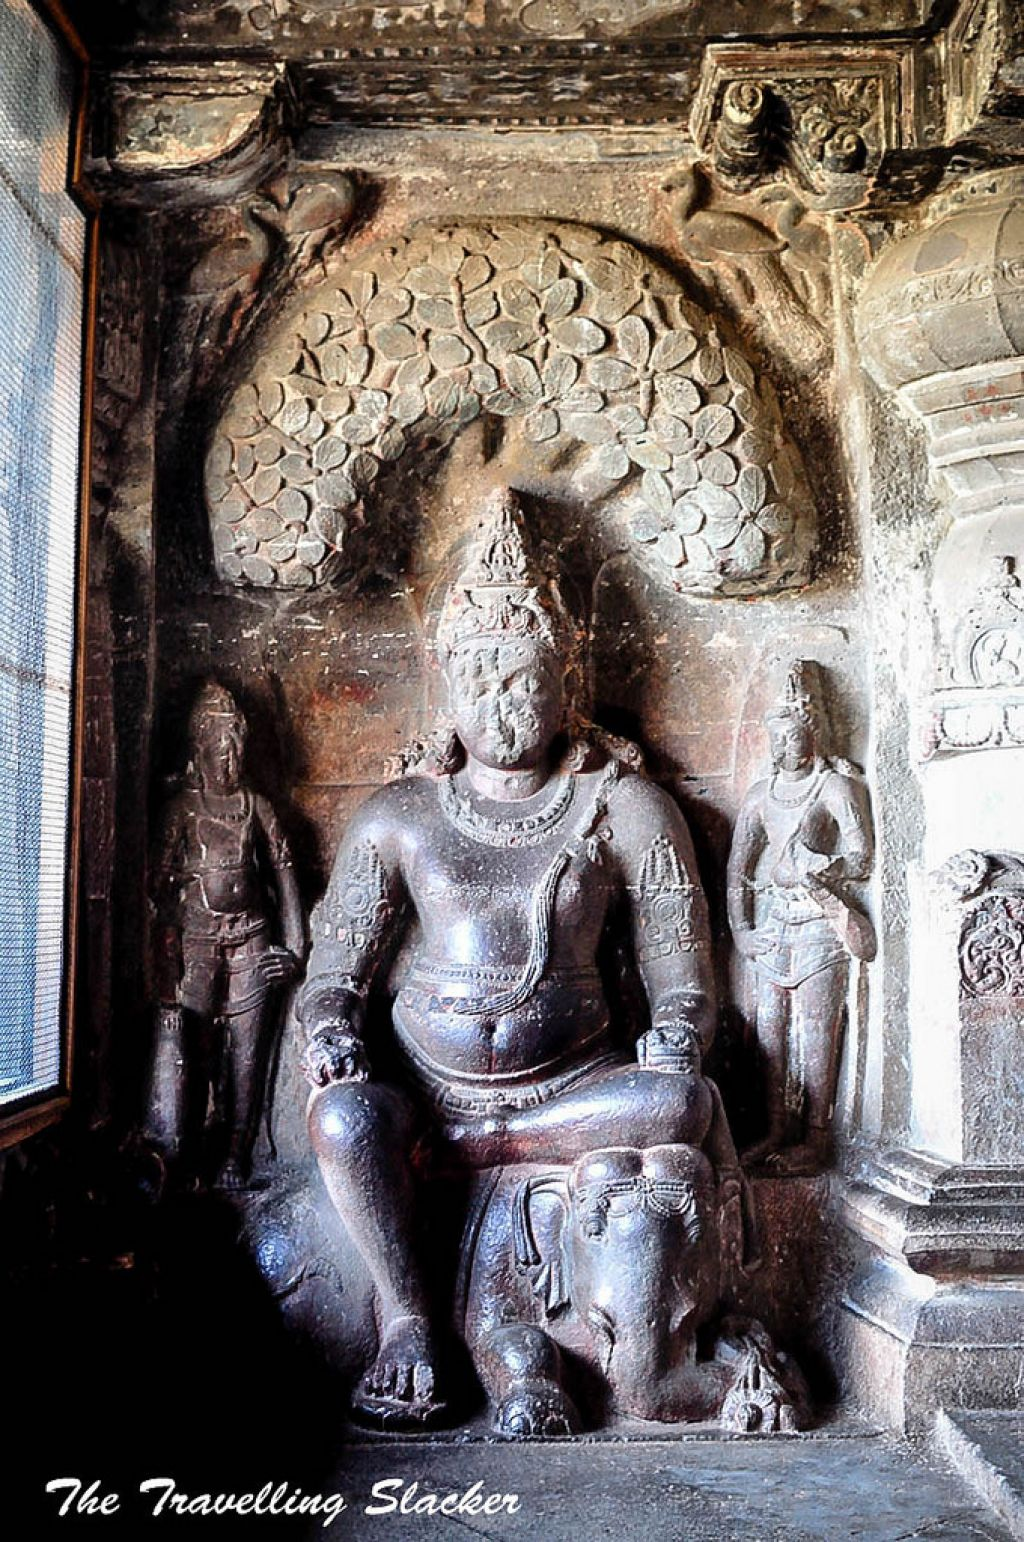 geyser hindu singles News archive home  2016  december  erupting geyser puts on a very rude, phallic-shaped display nepali girl dies due to banned hindu practice.